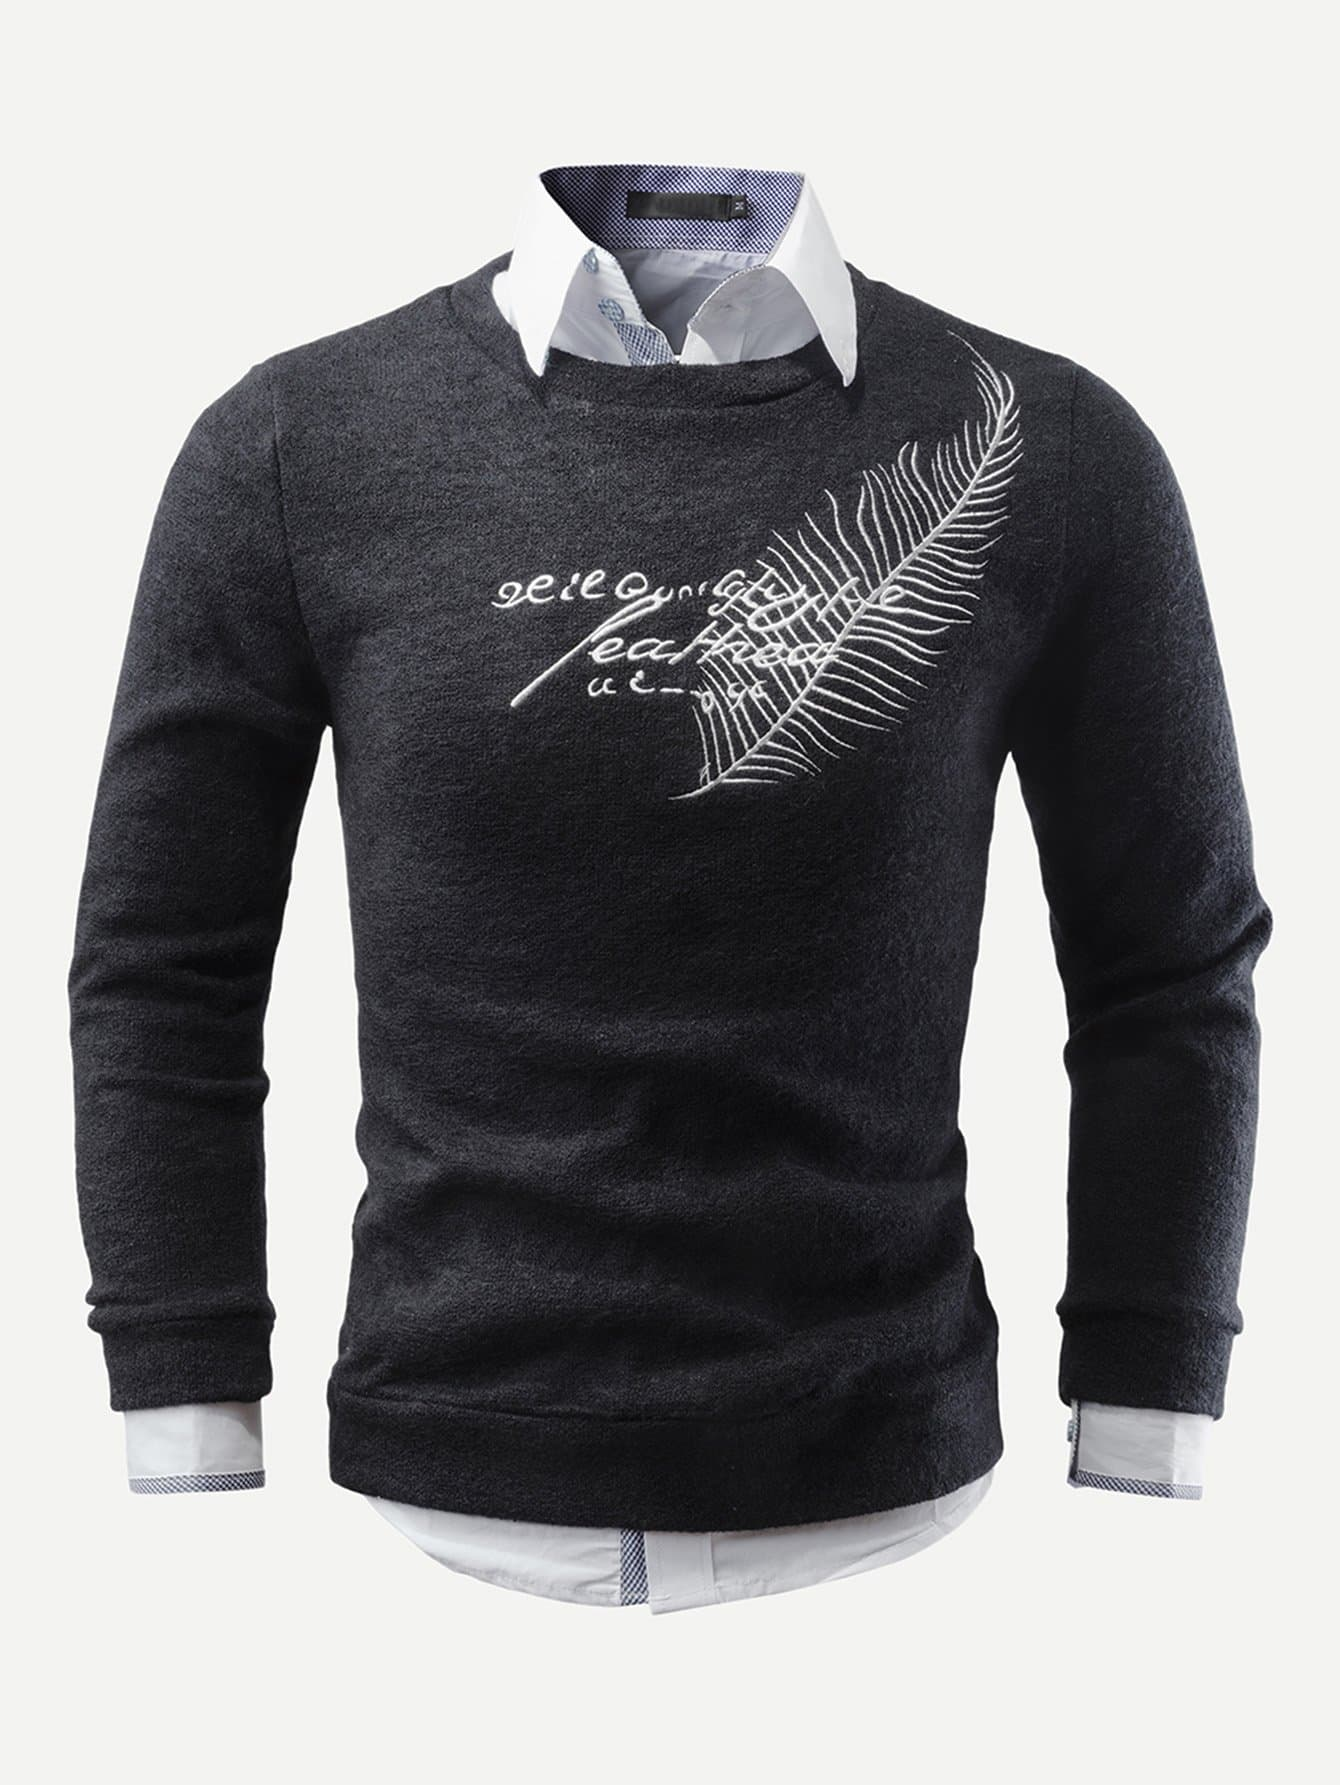 Фото - Мужский свитер с вышивкой от SheIn черного цвета